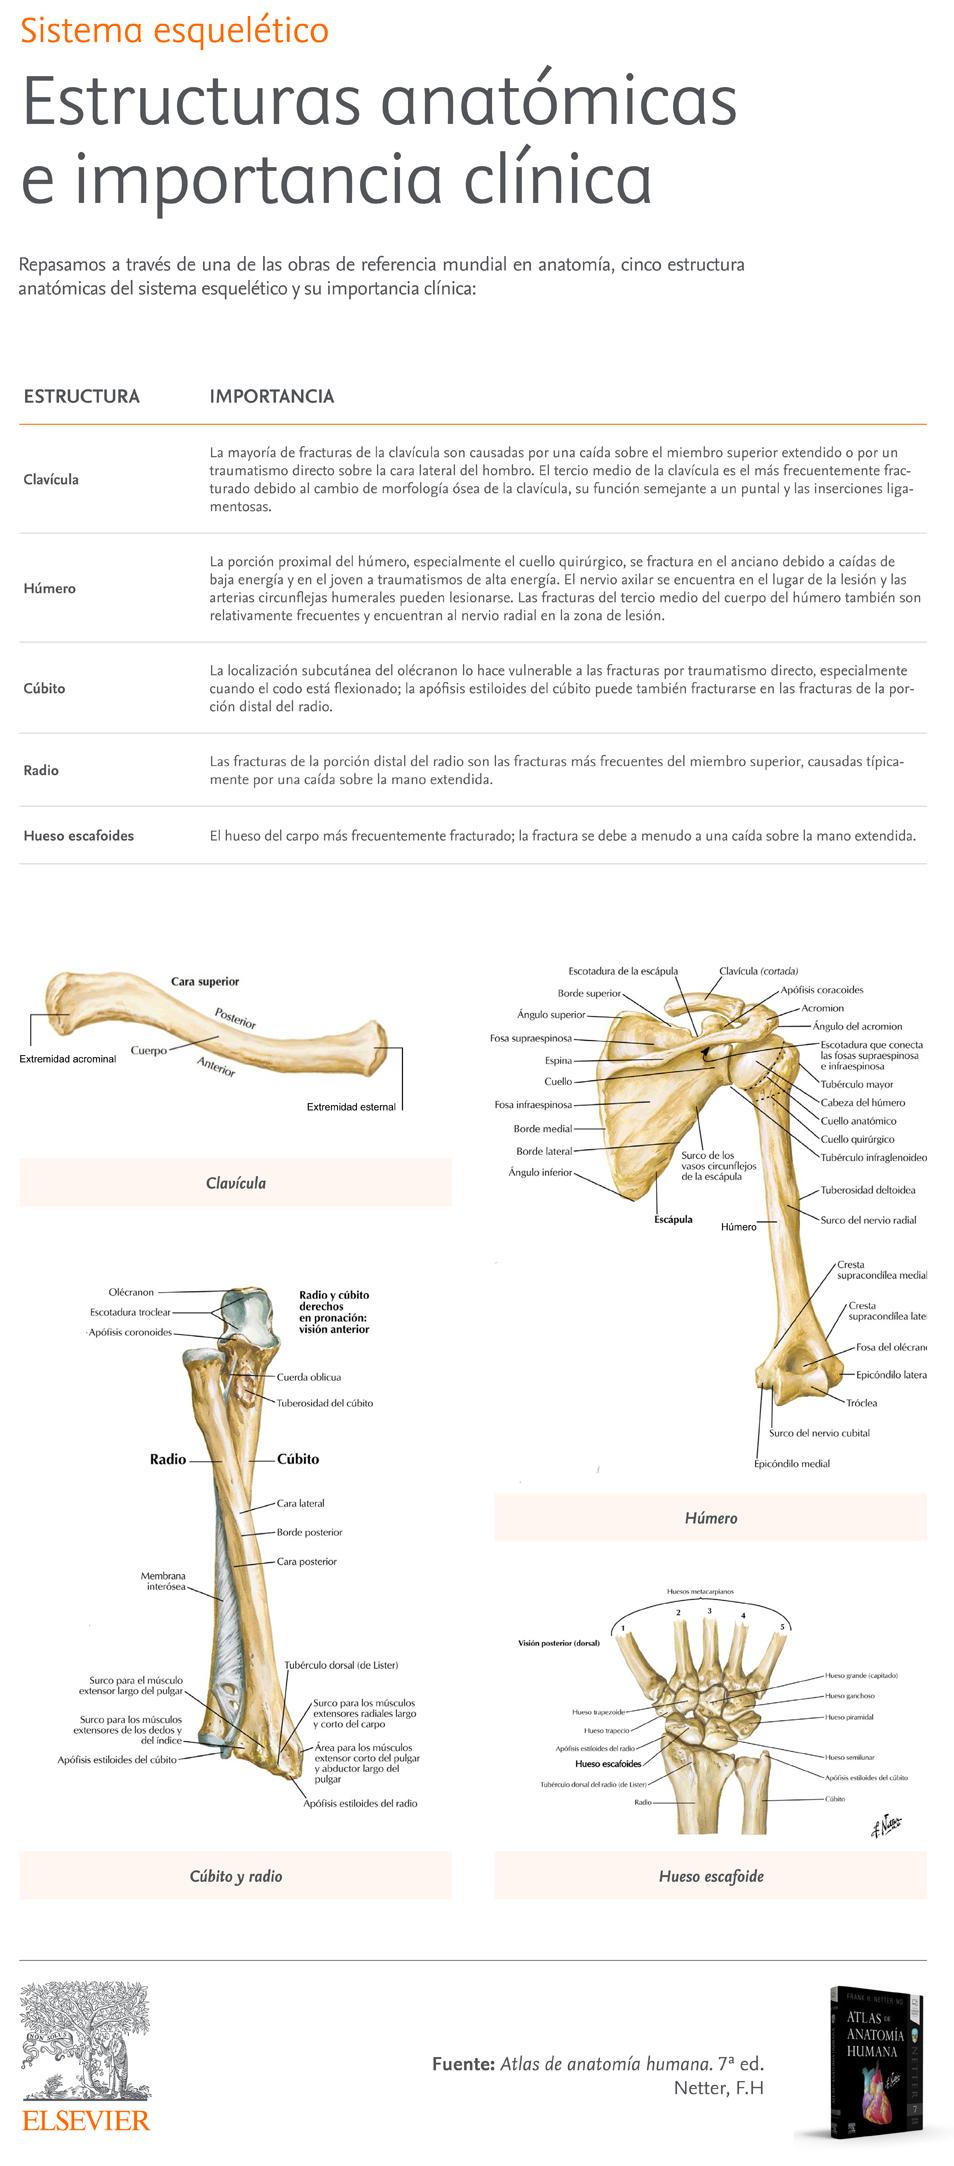 Infografia-Sistema-esqueletico_Estructuras-anatomicas-importancia-clinica.jpg